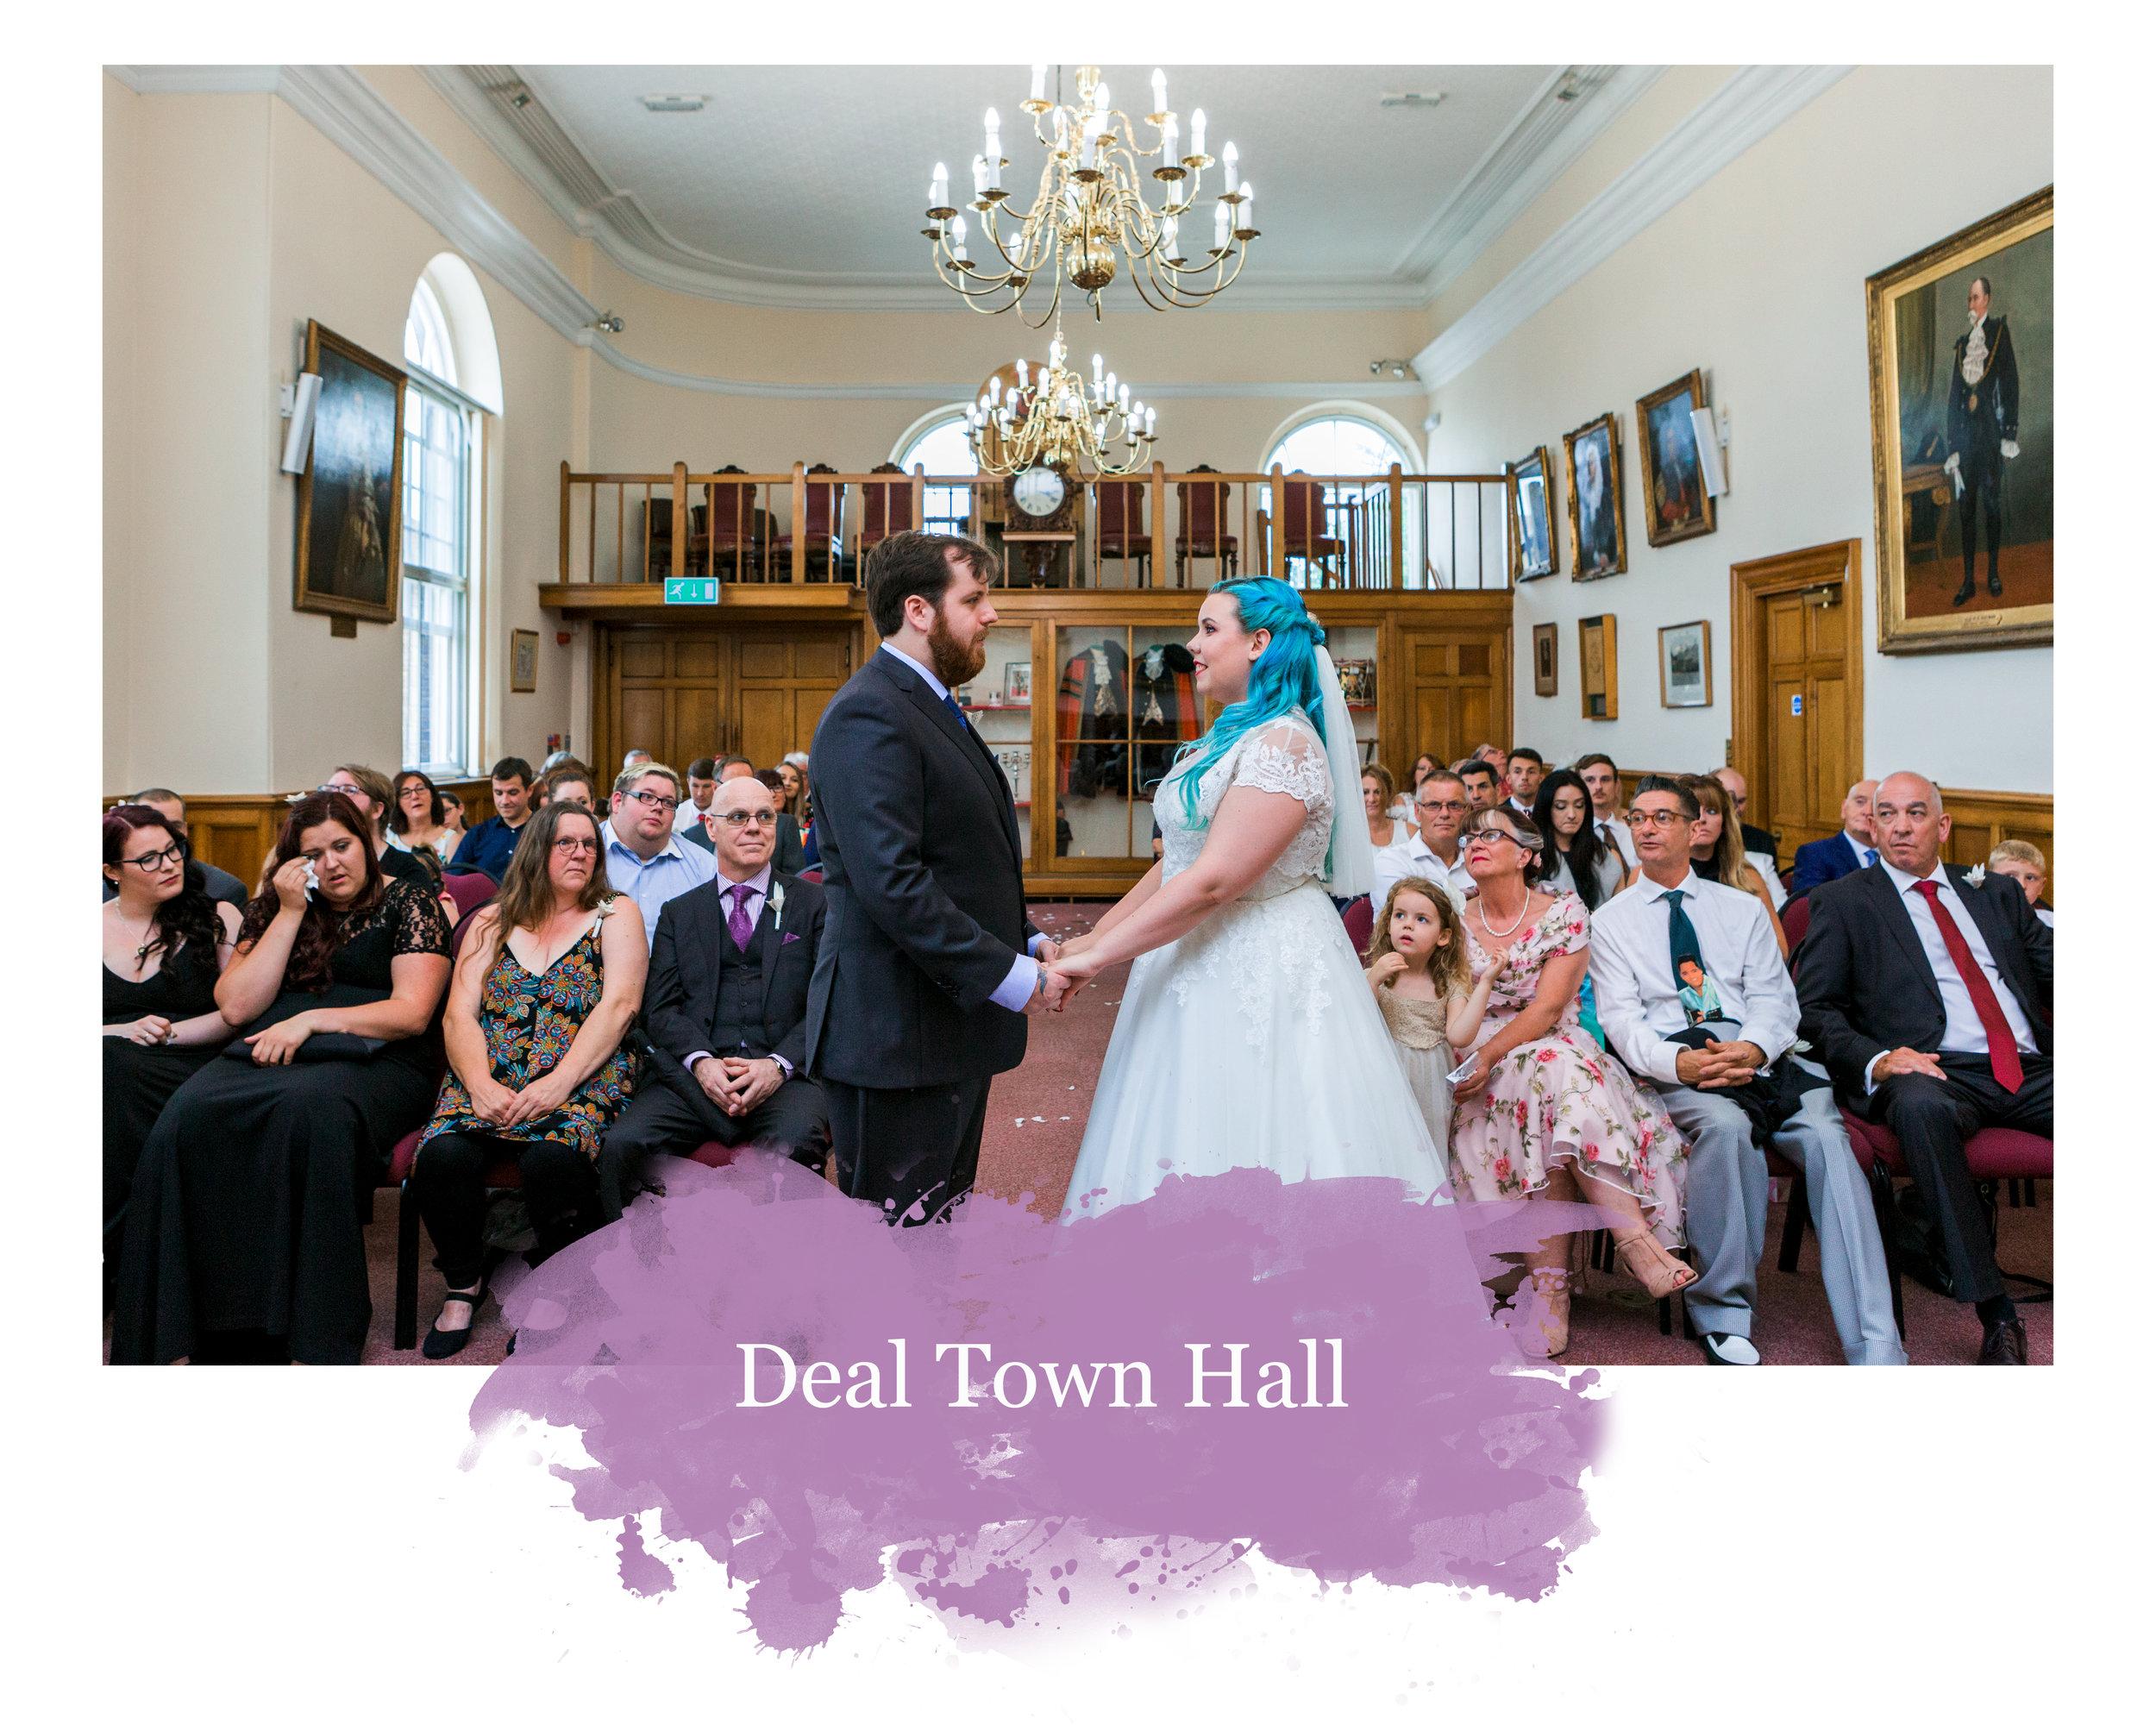 Deal Town Hall.jpg